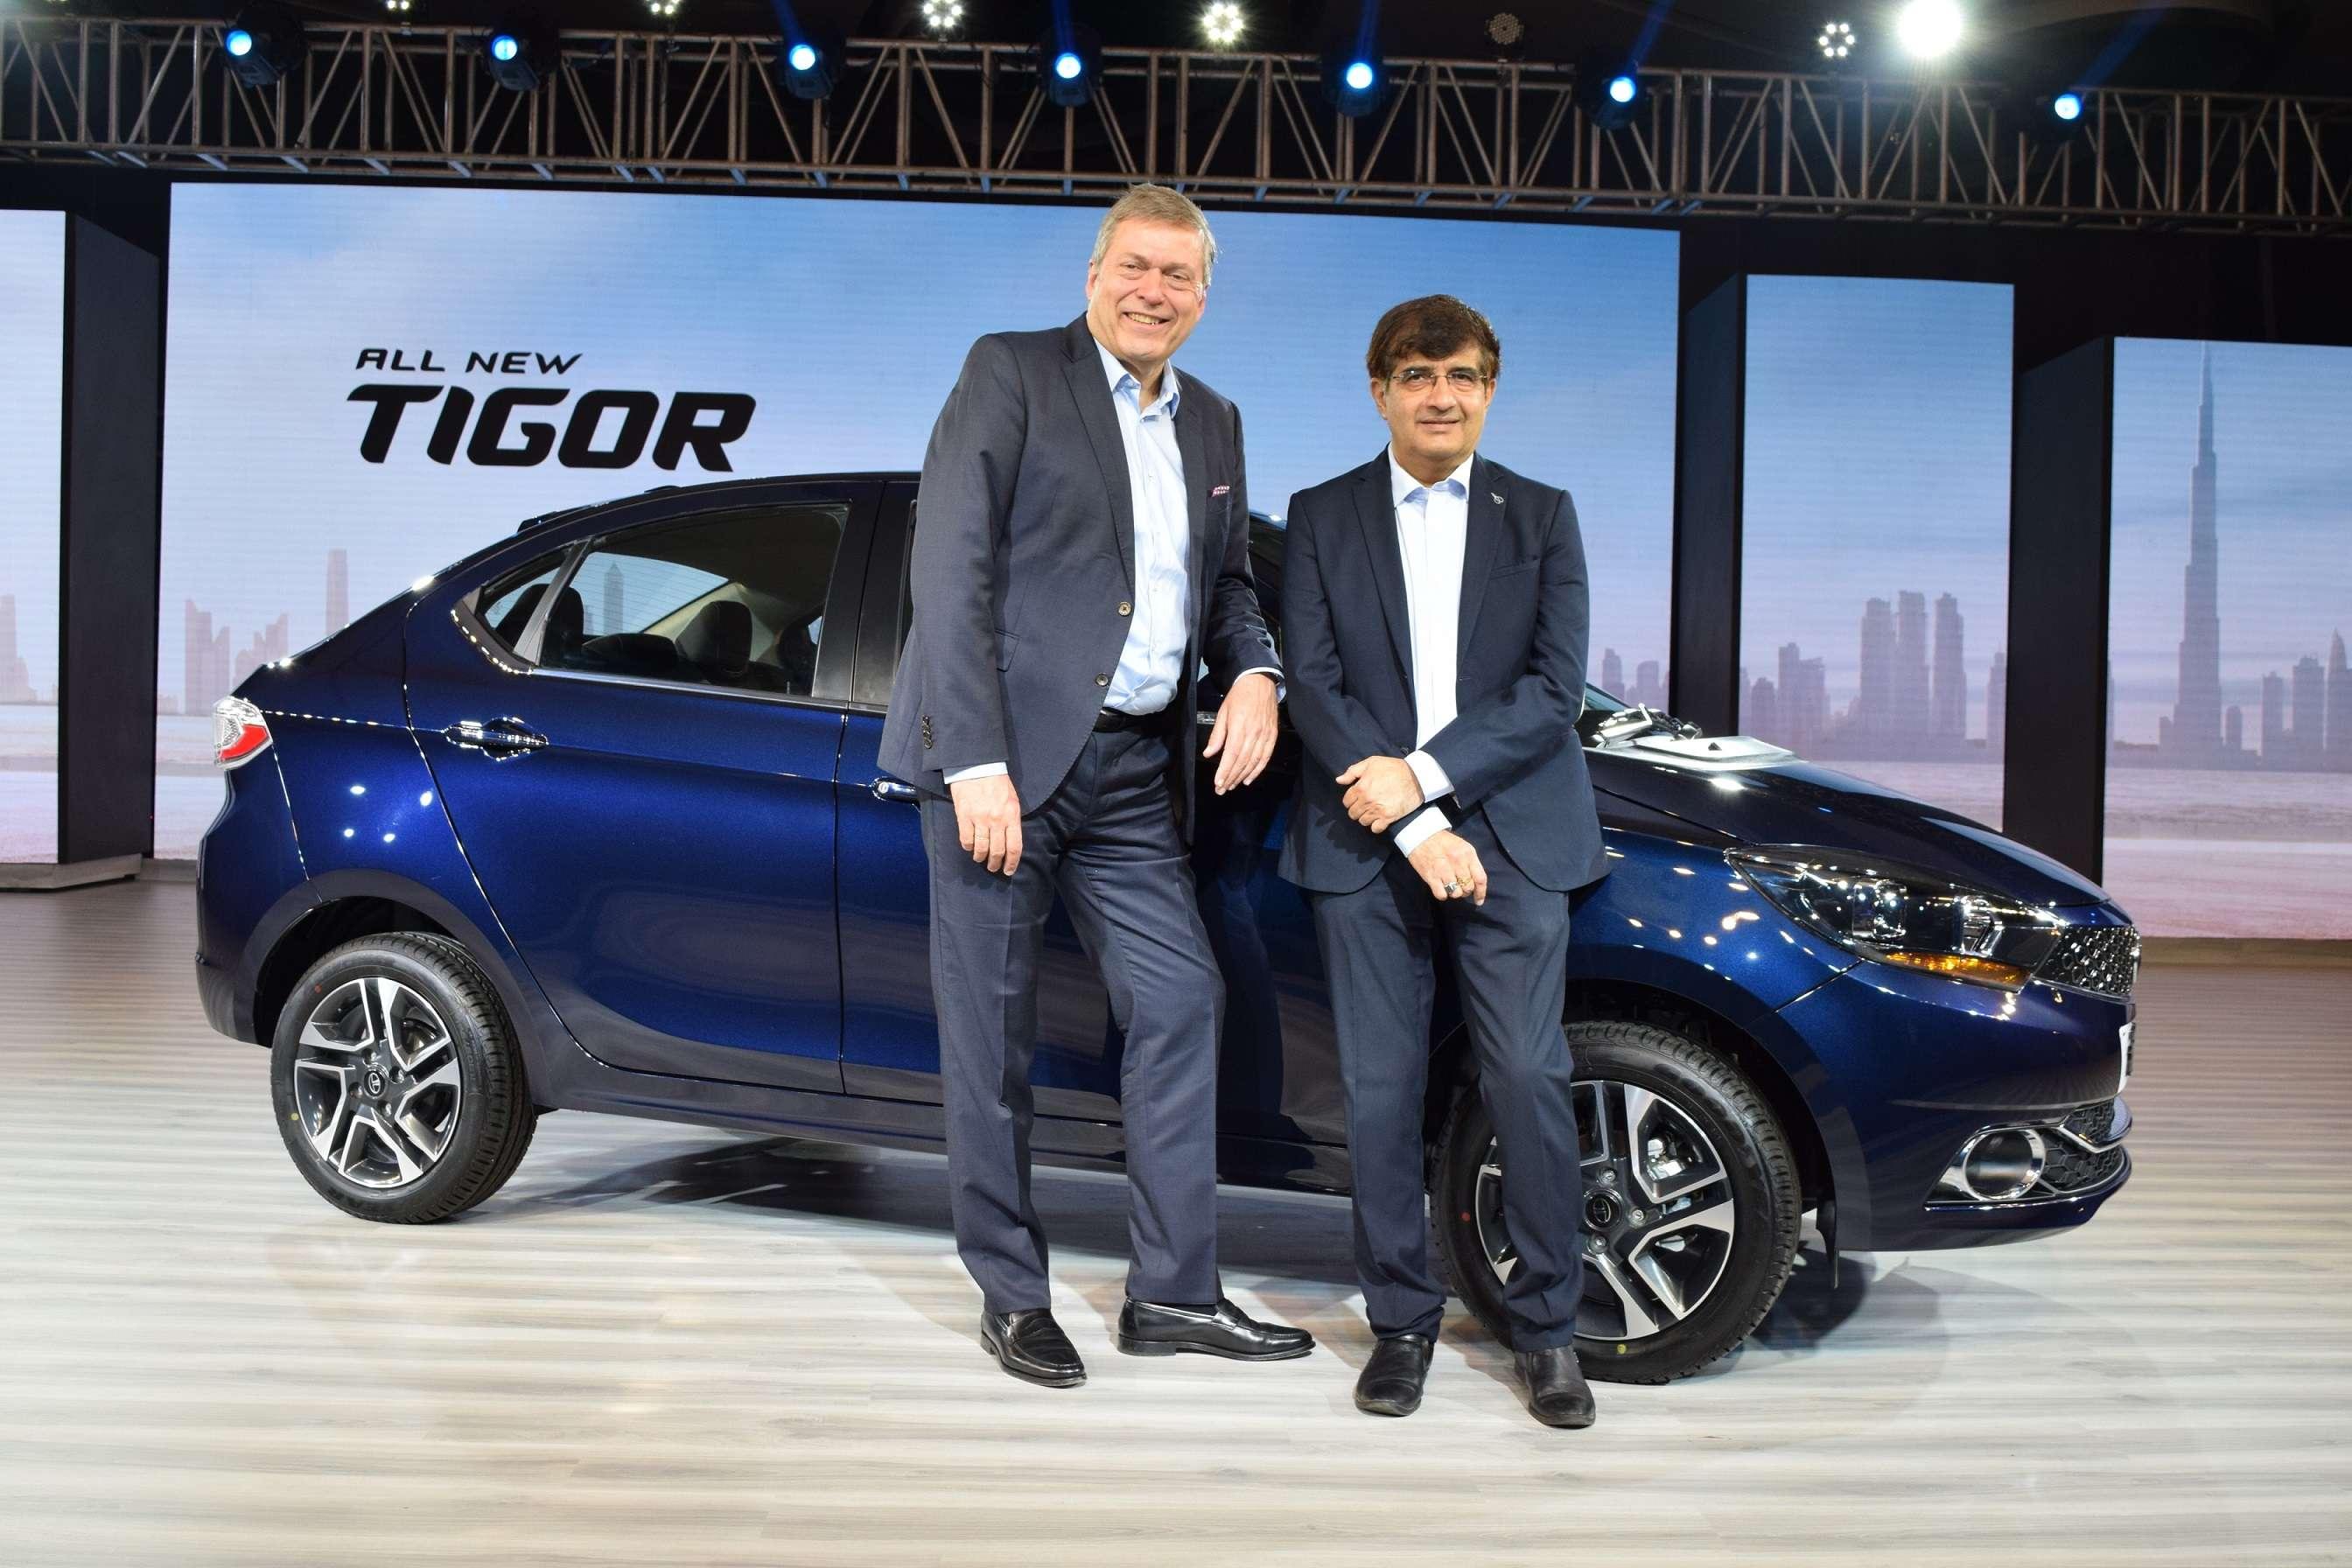 New Tigor: Tata Motors launches new Tigor at starting price